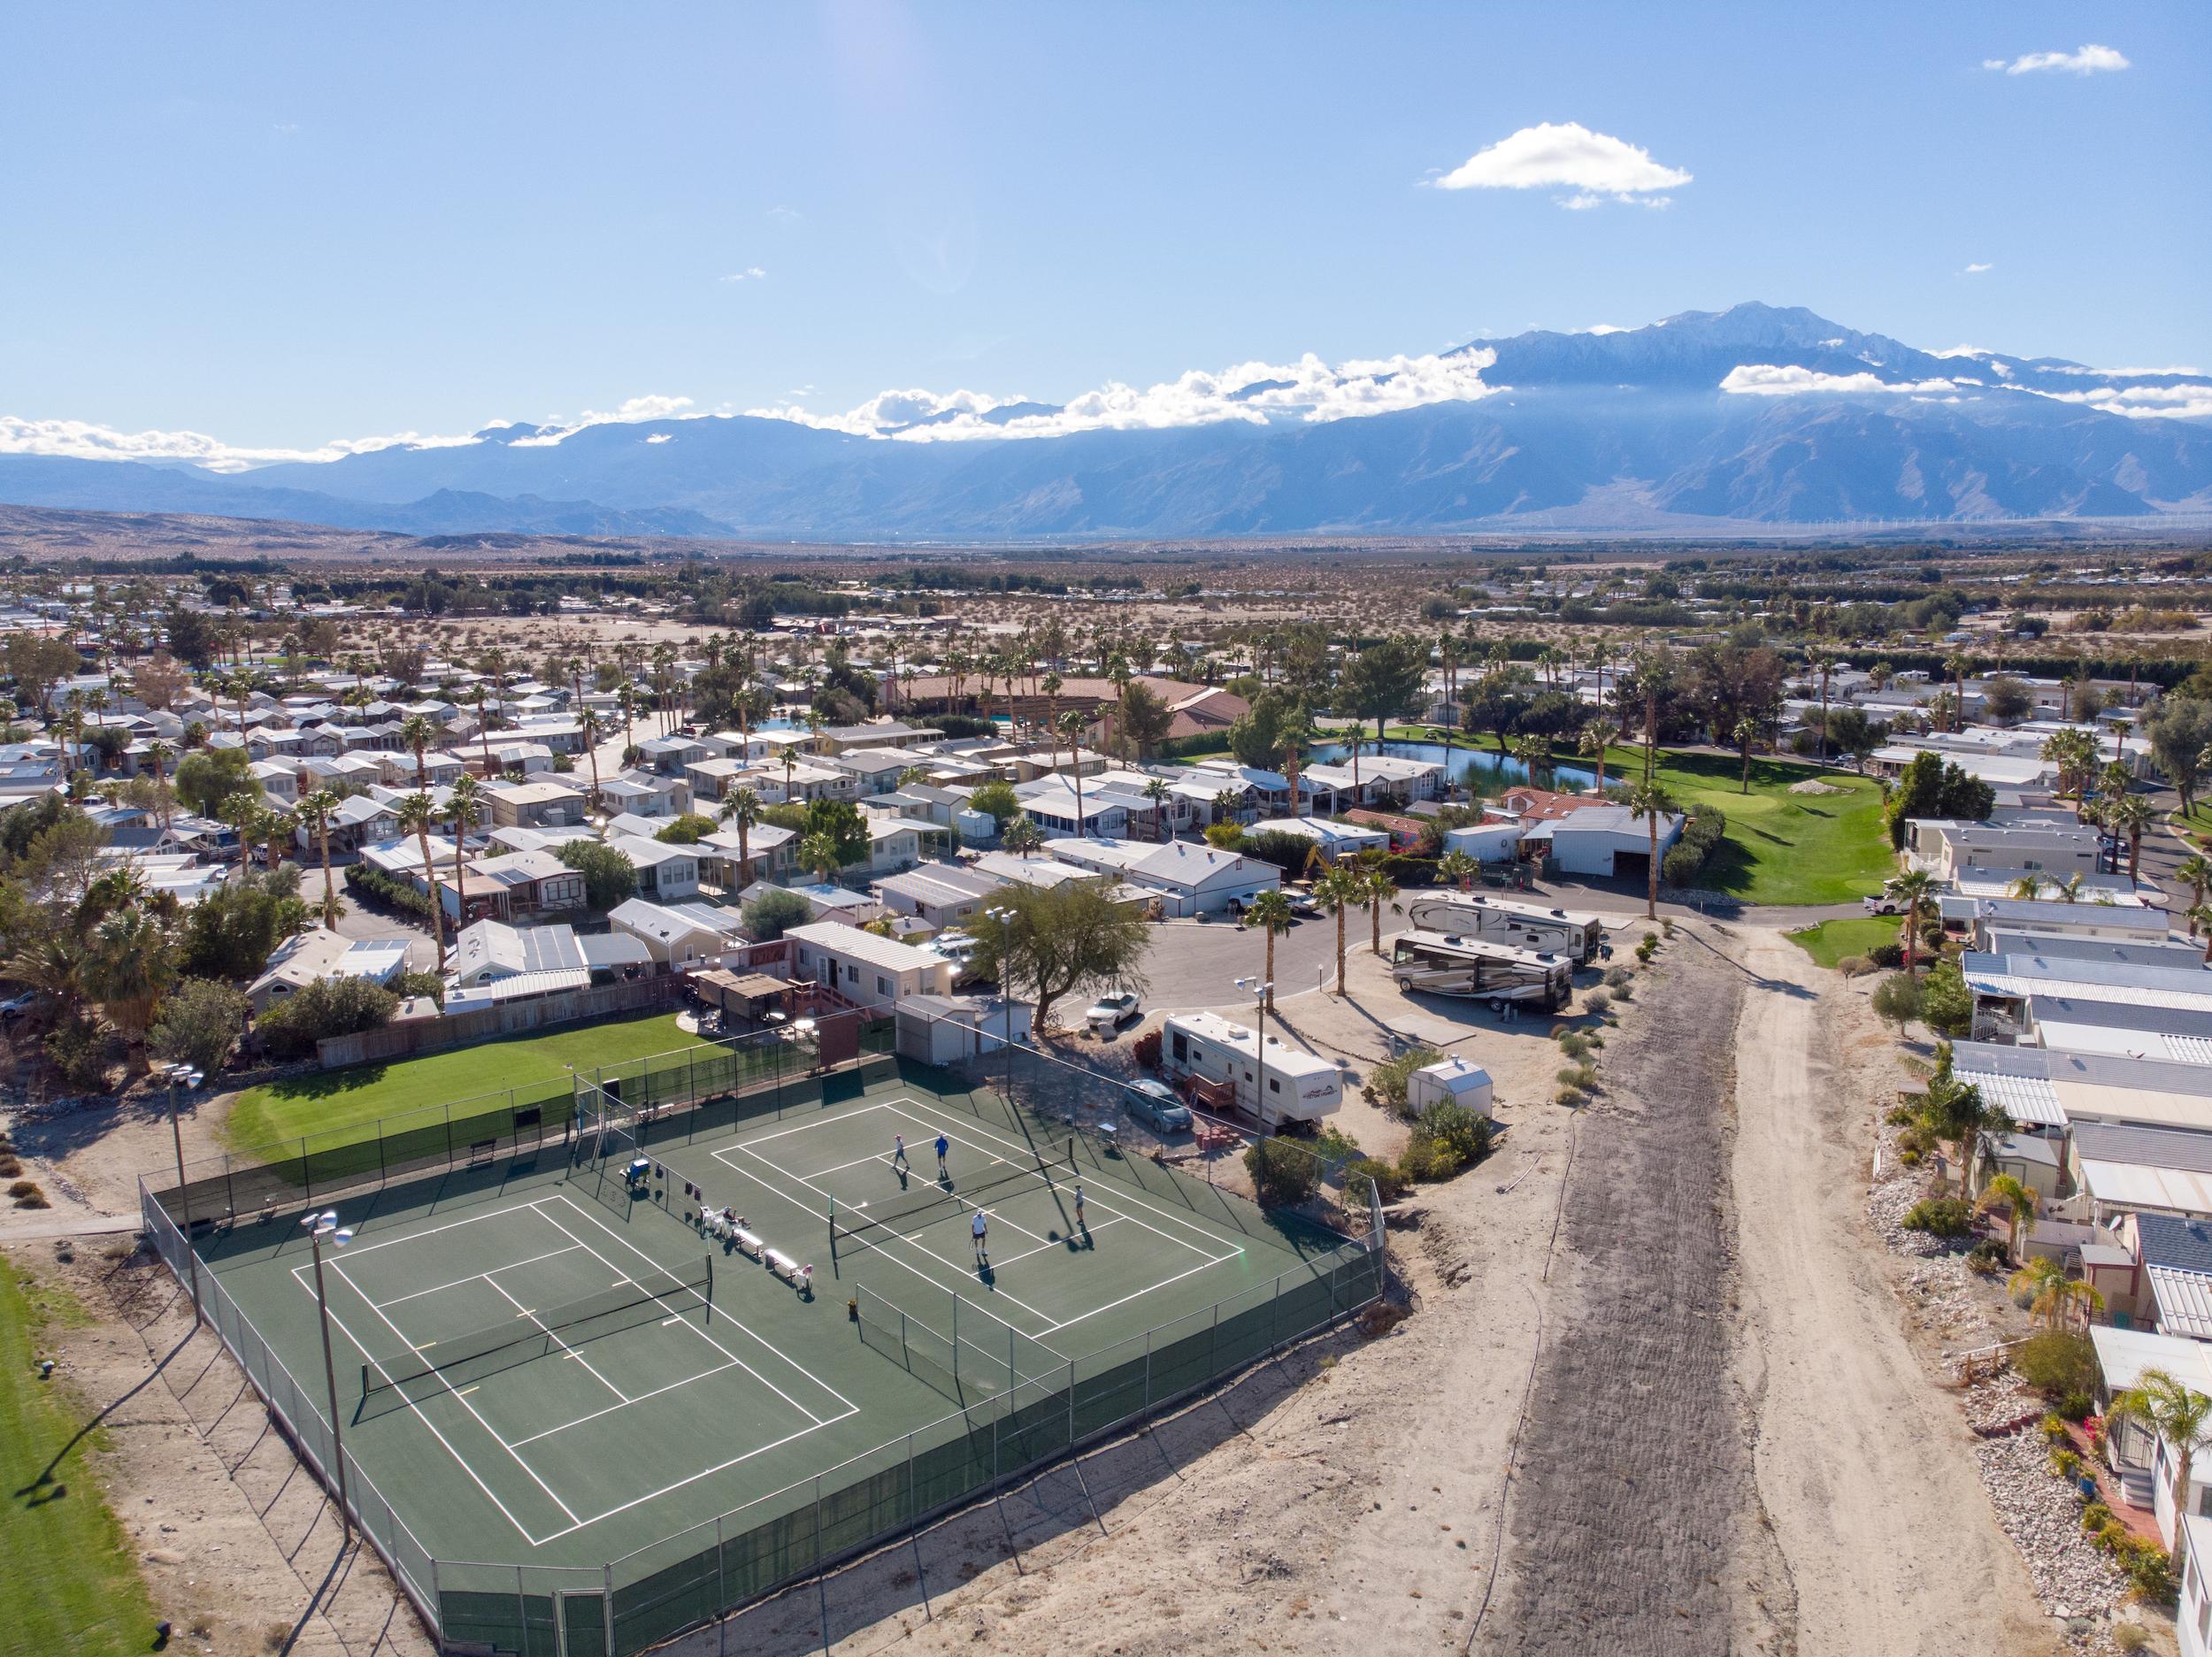 caliente-tennis-courts-aerial.jpg